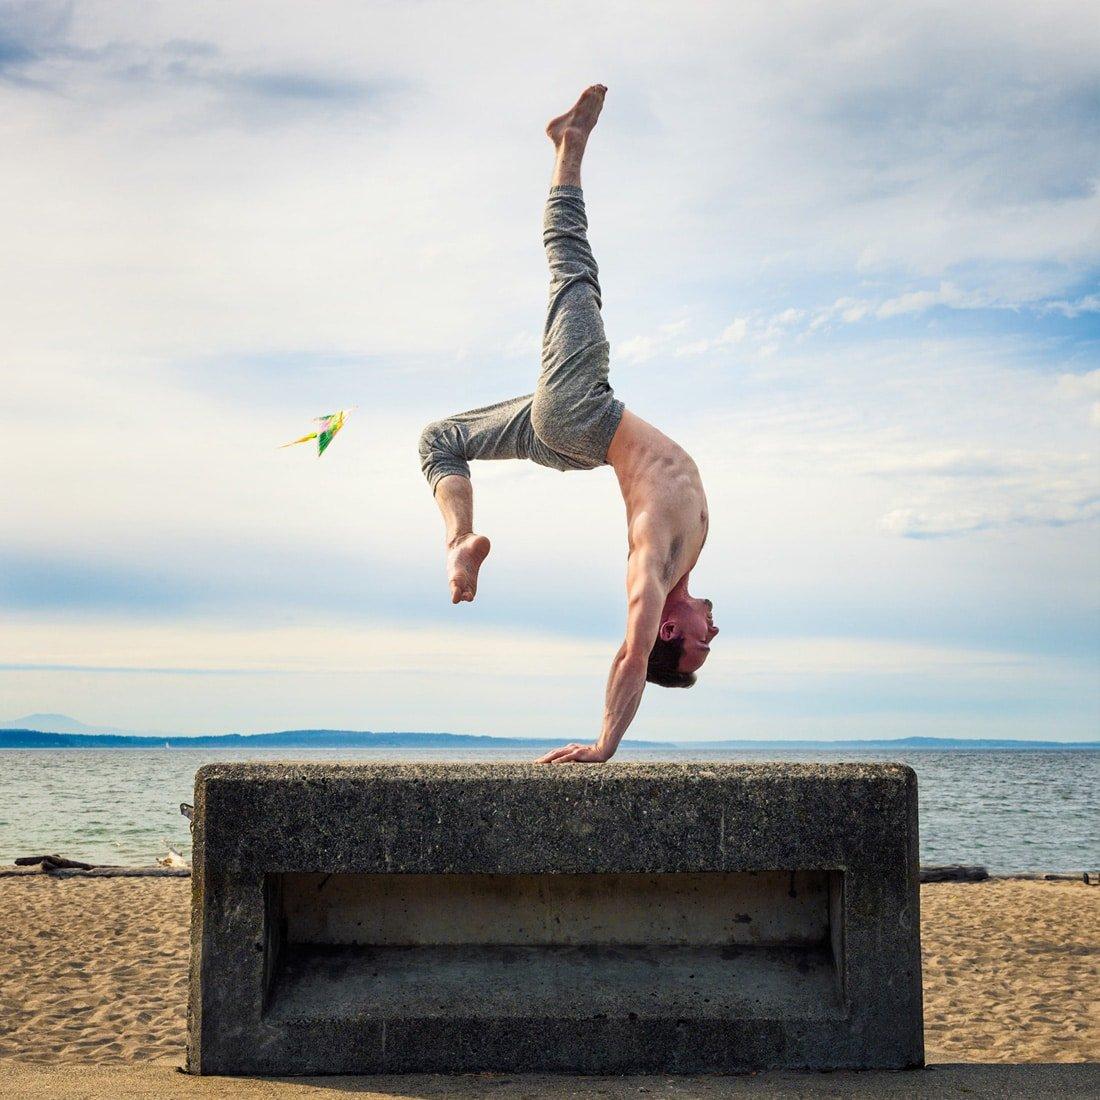 amit-lingwal-team-aadi-yoga-school